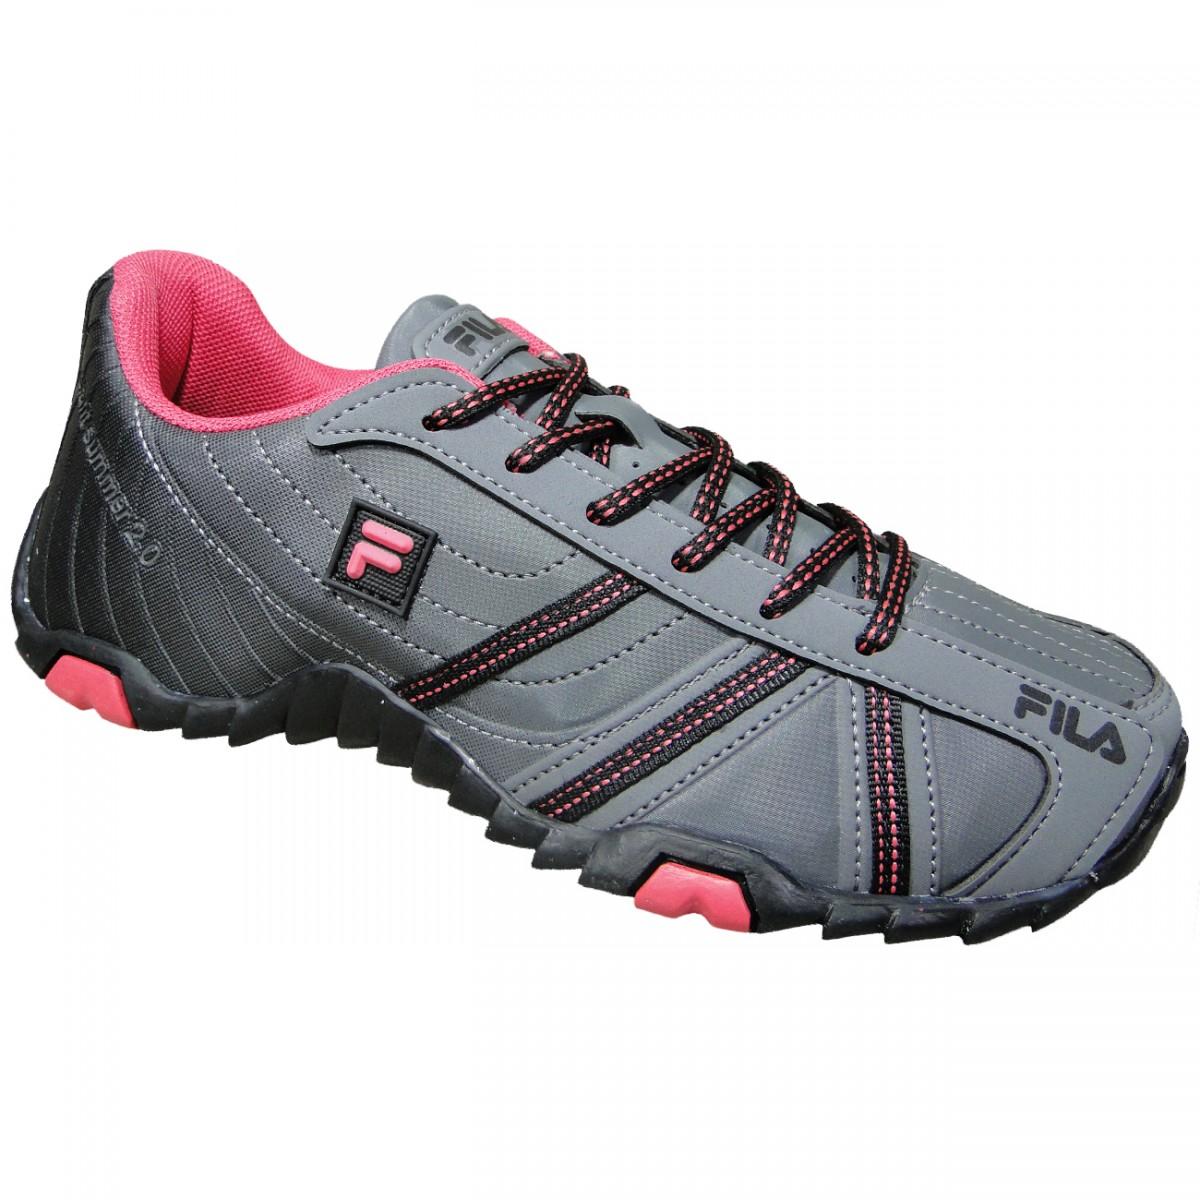 eb8468ab2a3 Tenis Fila Slant Summer 2.0 623933 - Grafite Preto Pink - Chuteira Nike